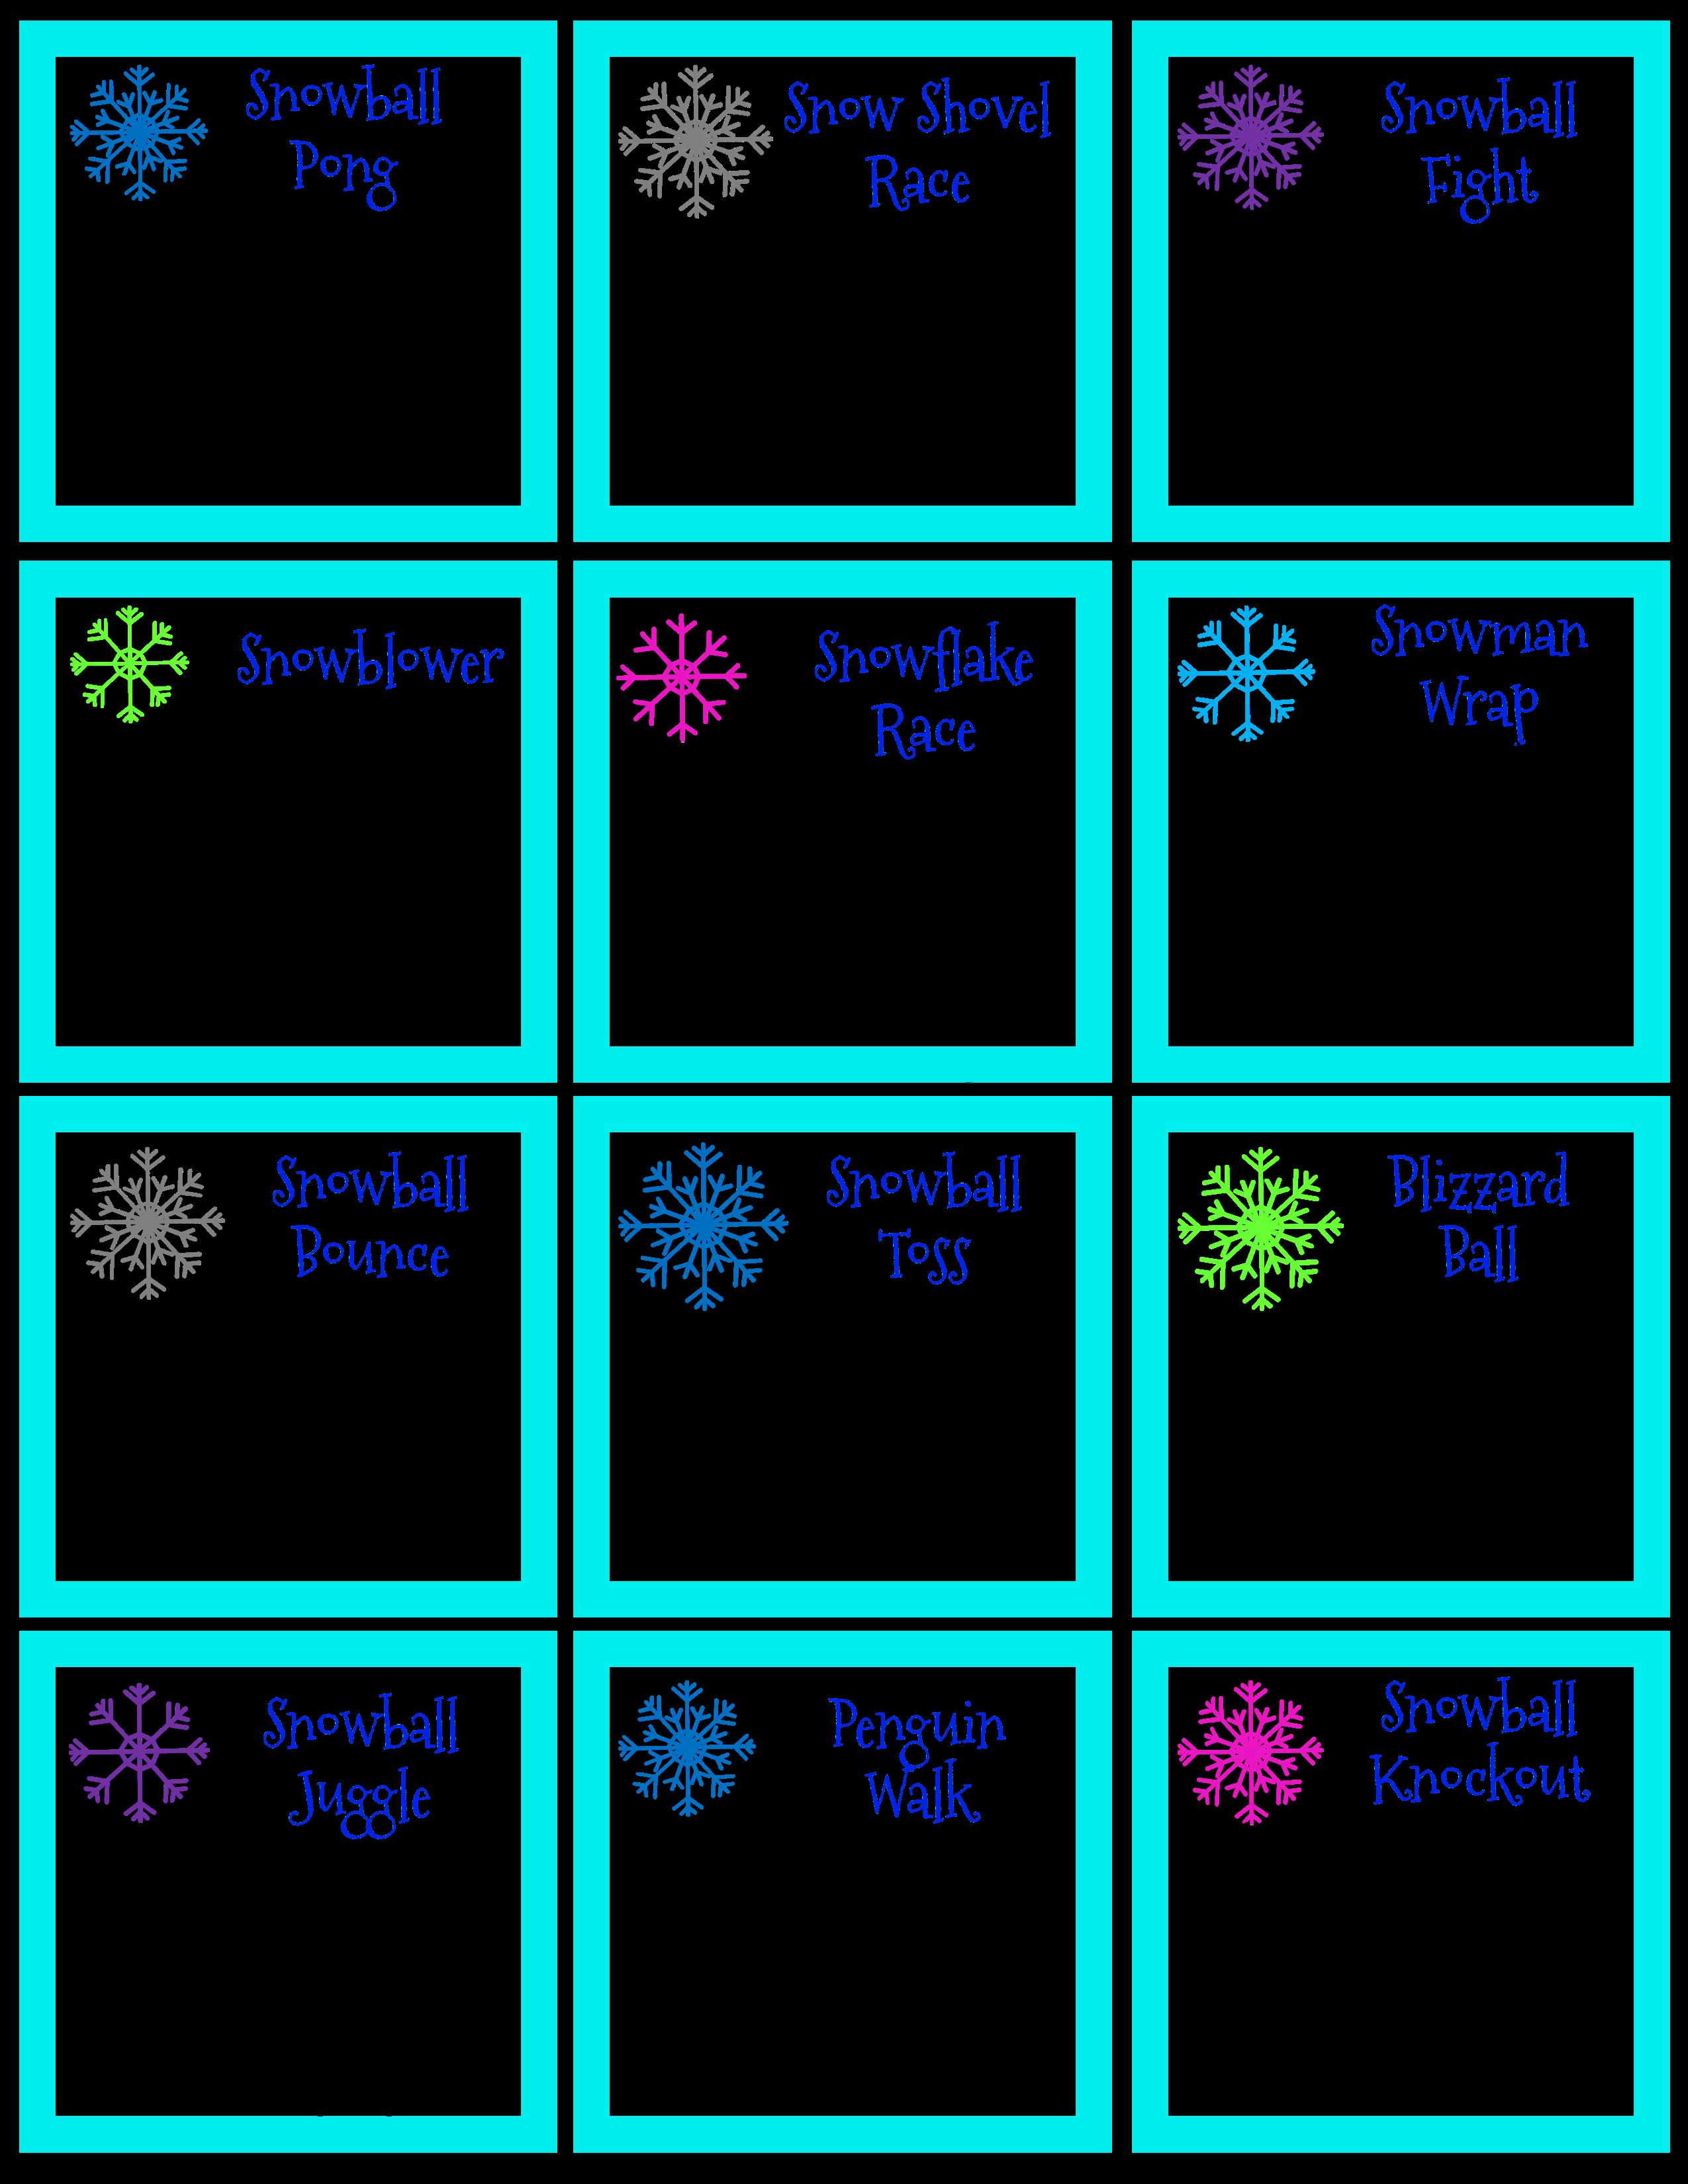 Snowball Games | Pinterest | Snowball games, Classroom party ideas ...